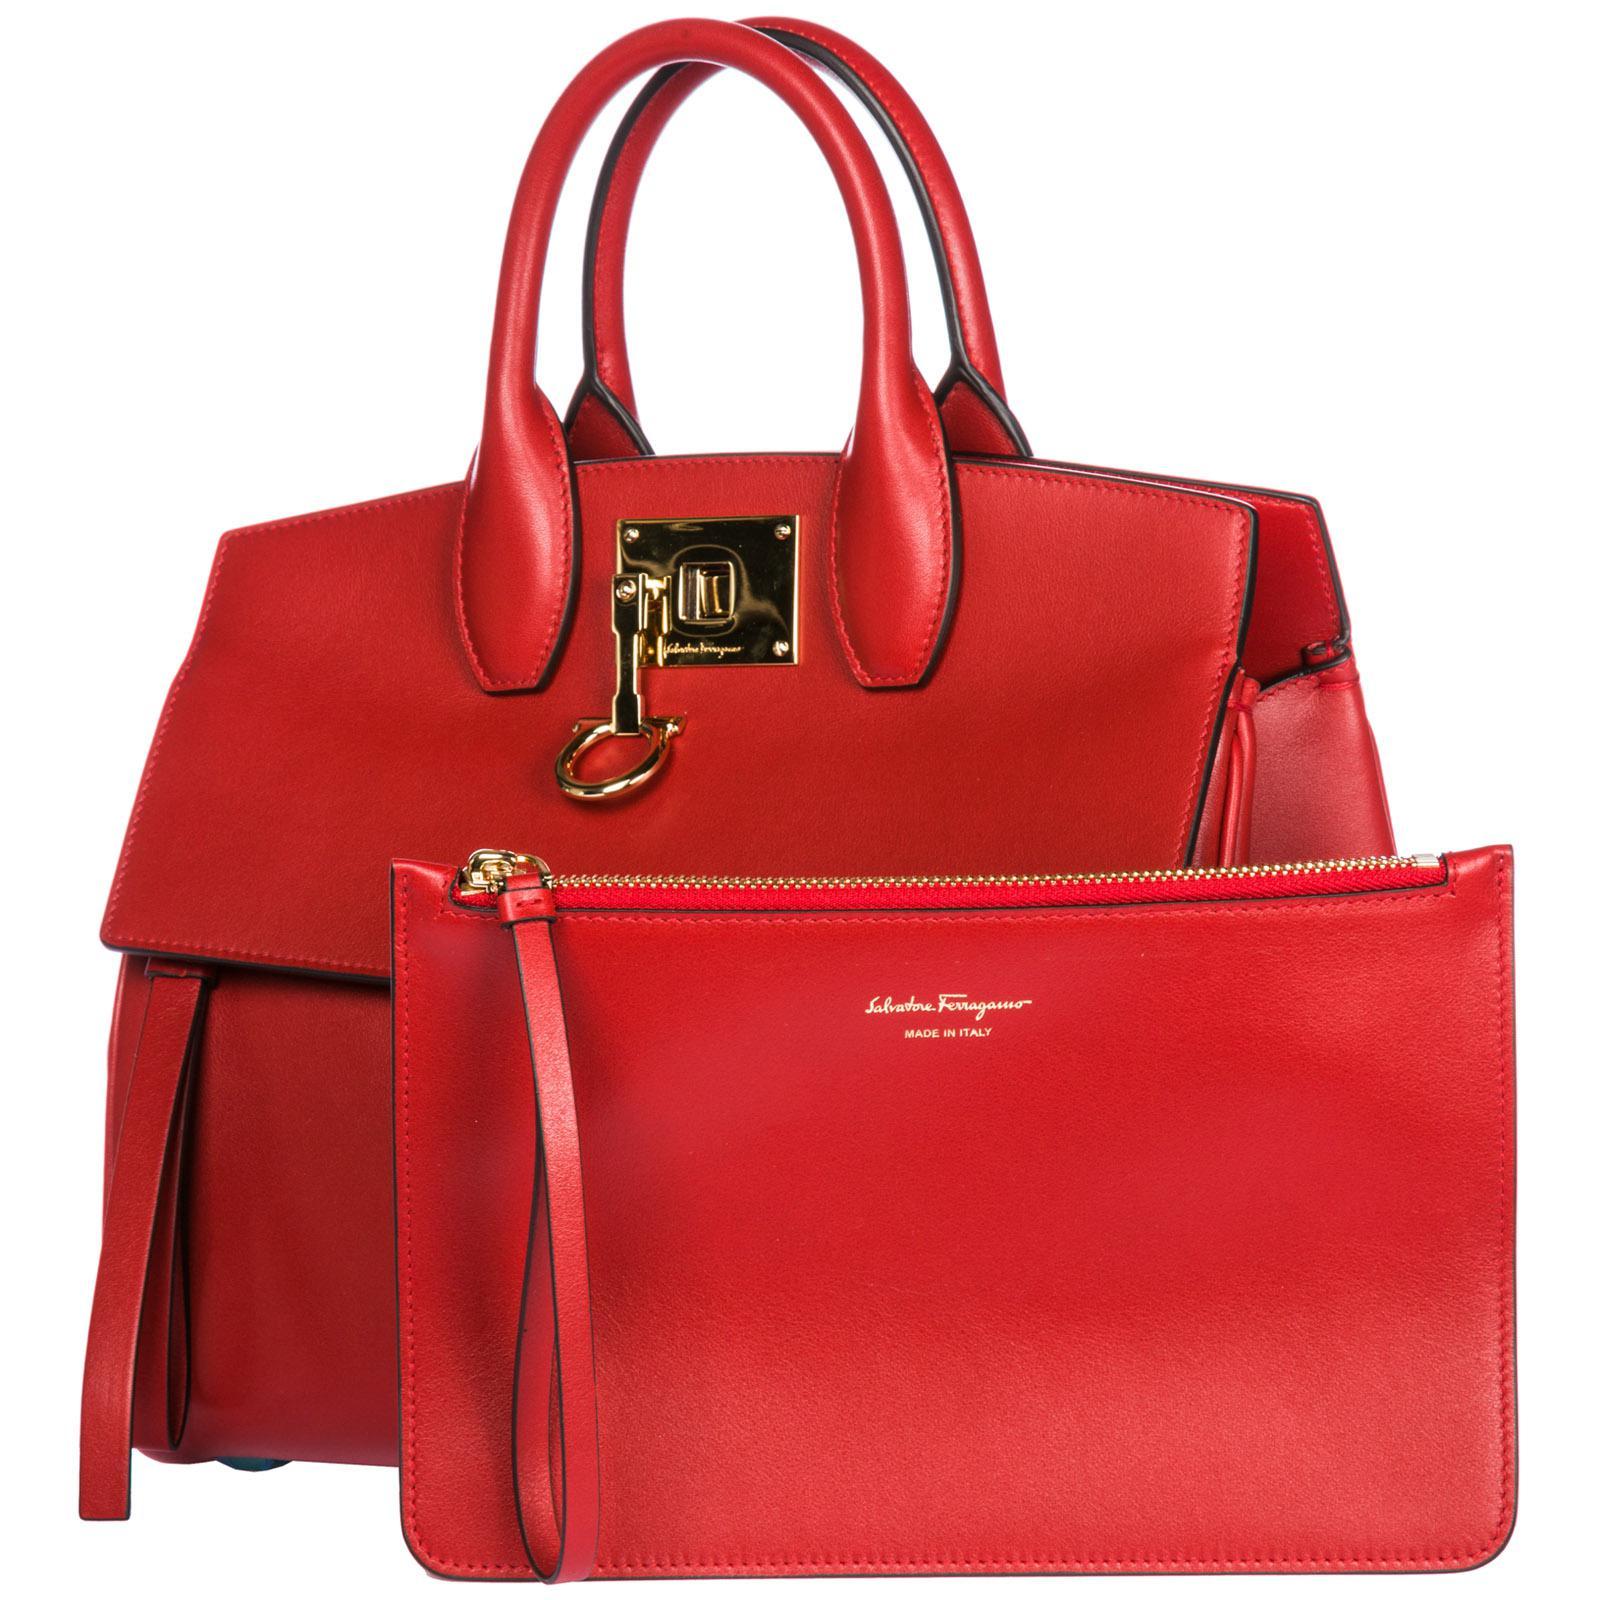 9802a368bce9 Ferragamo - Red Leather Handbag Shopping Bag Purse Studio Bag - Lyst. View  fullscreen